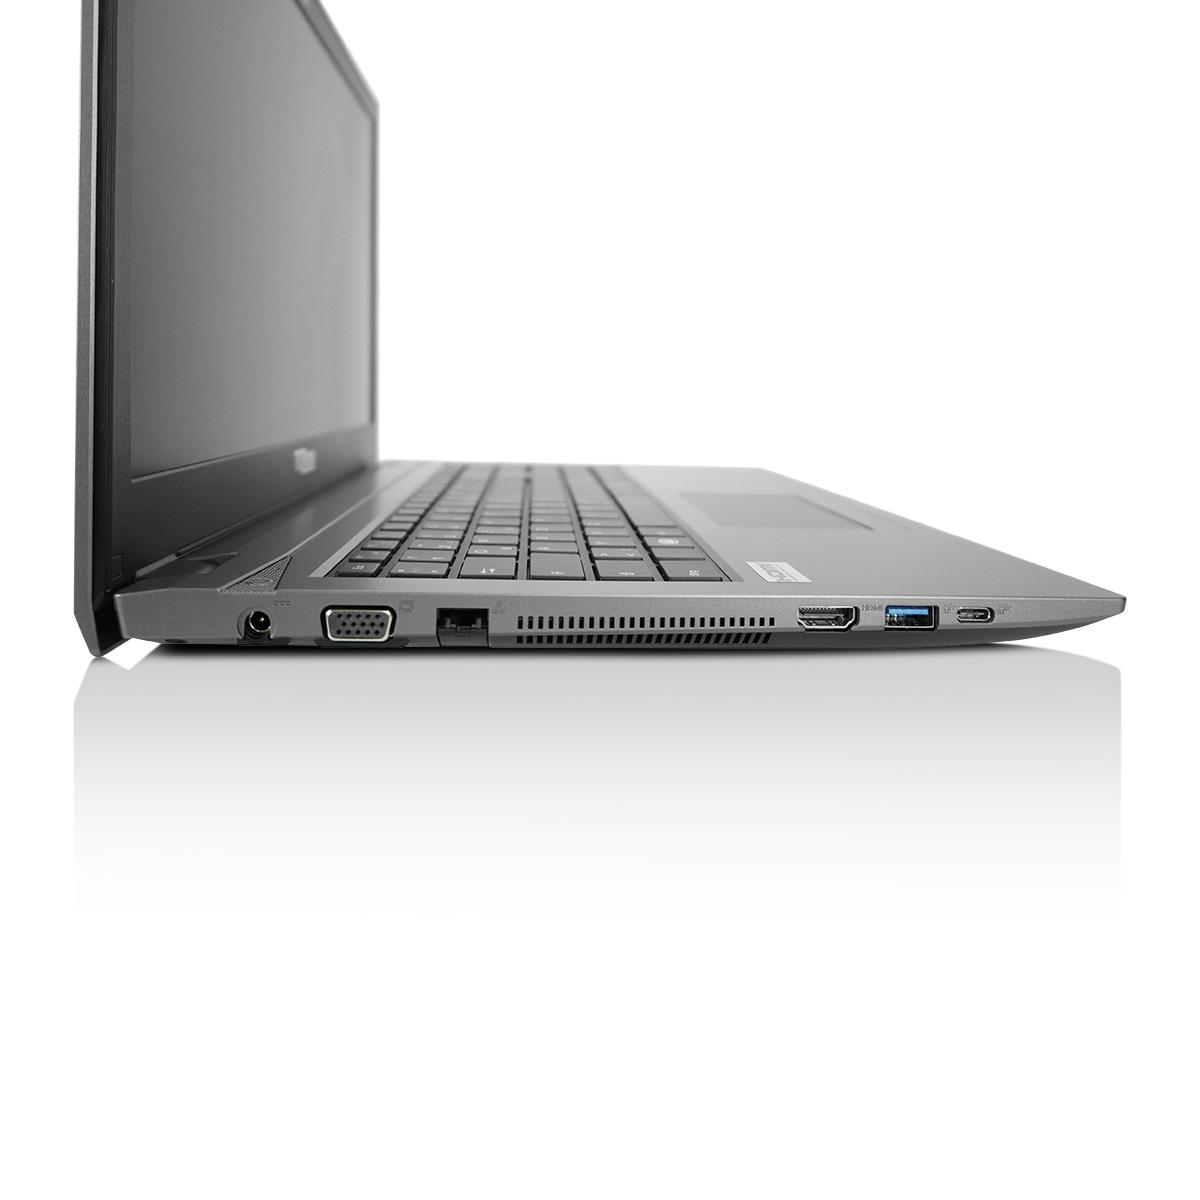 TUXEDO Book BS1507 - 15,6 Zoll matt Full-HD IPS + Intel Core i7 ...